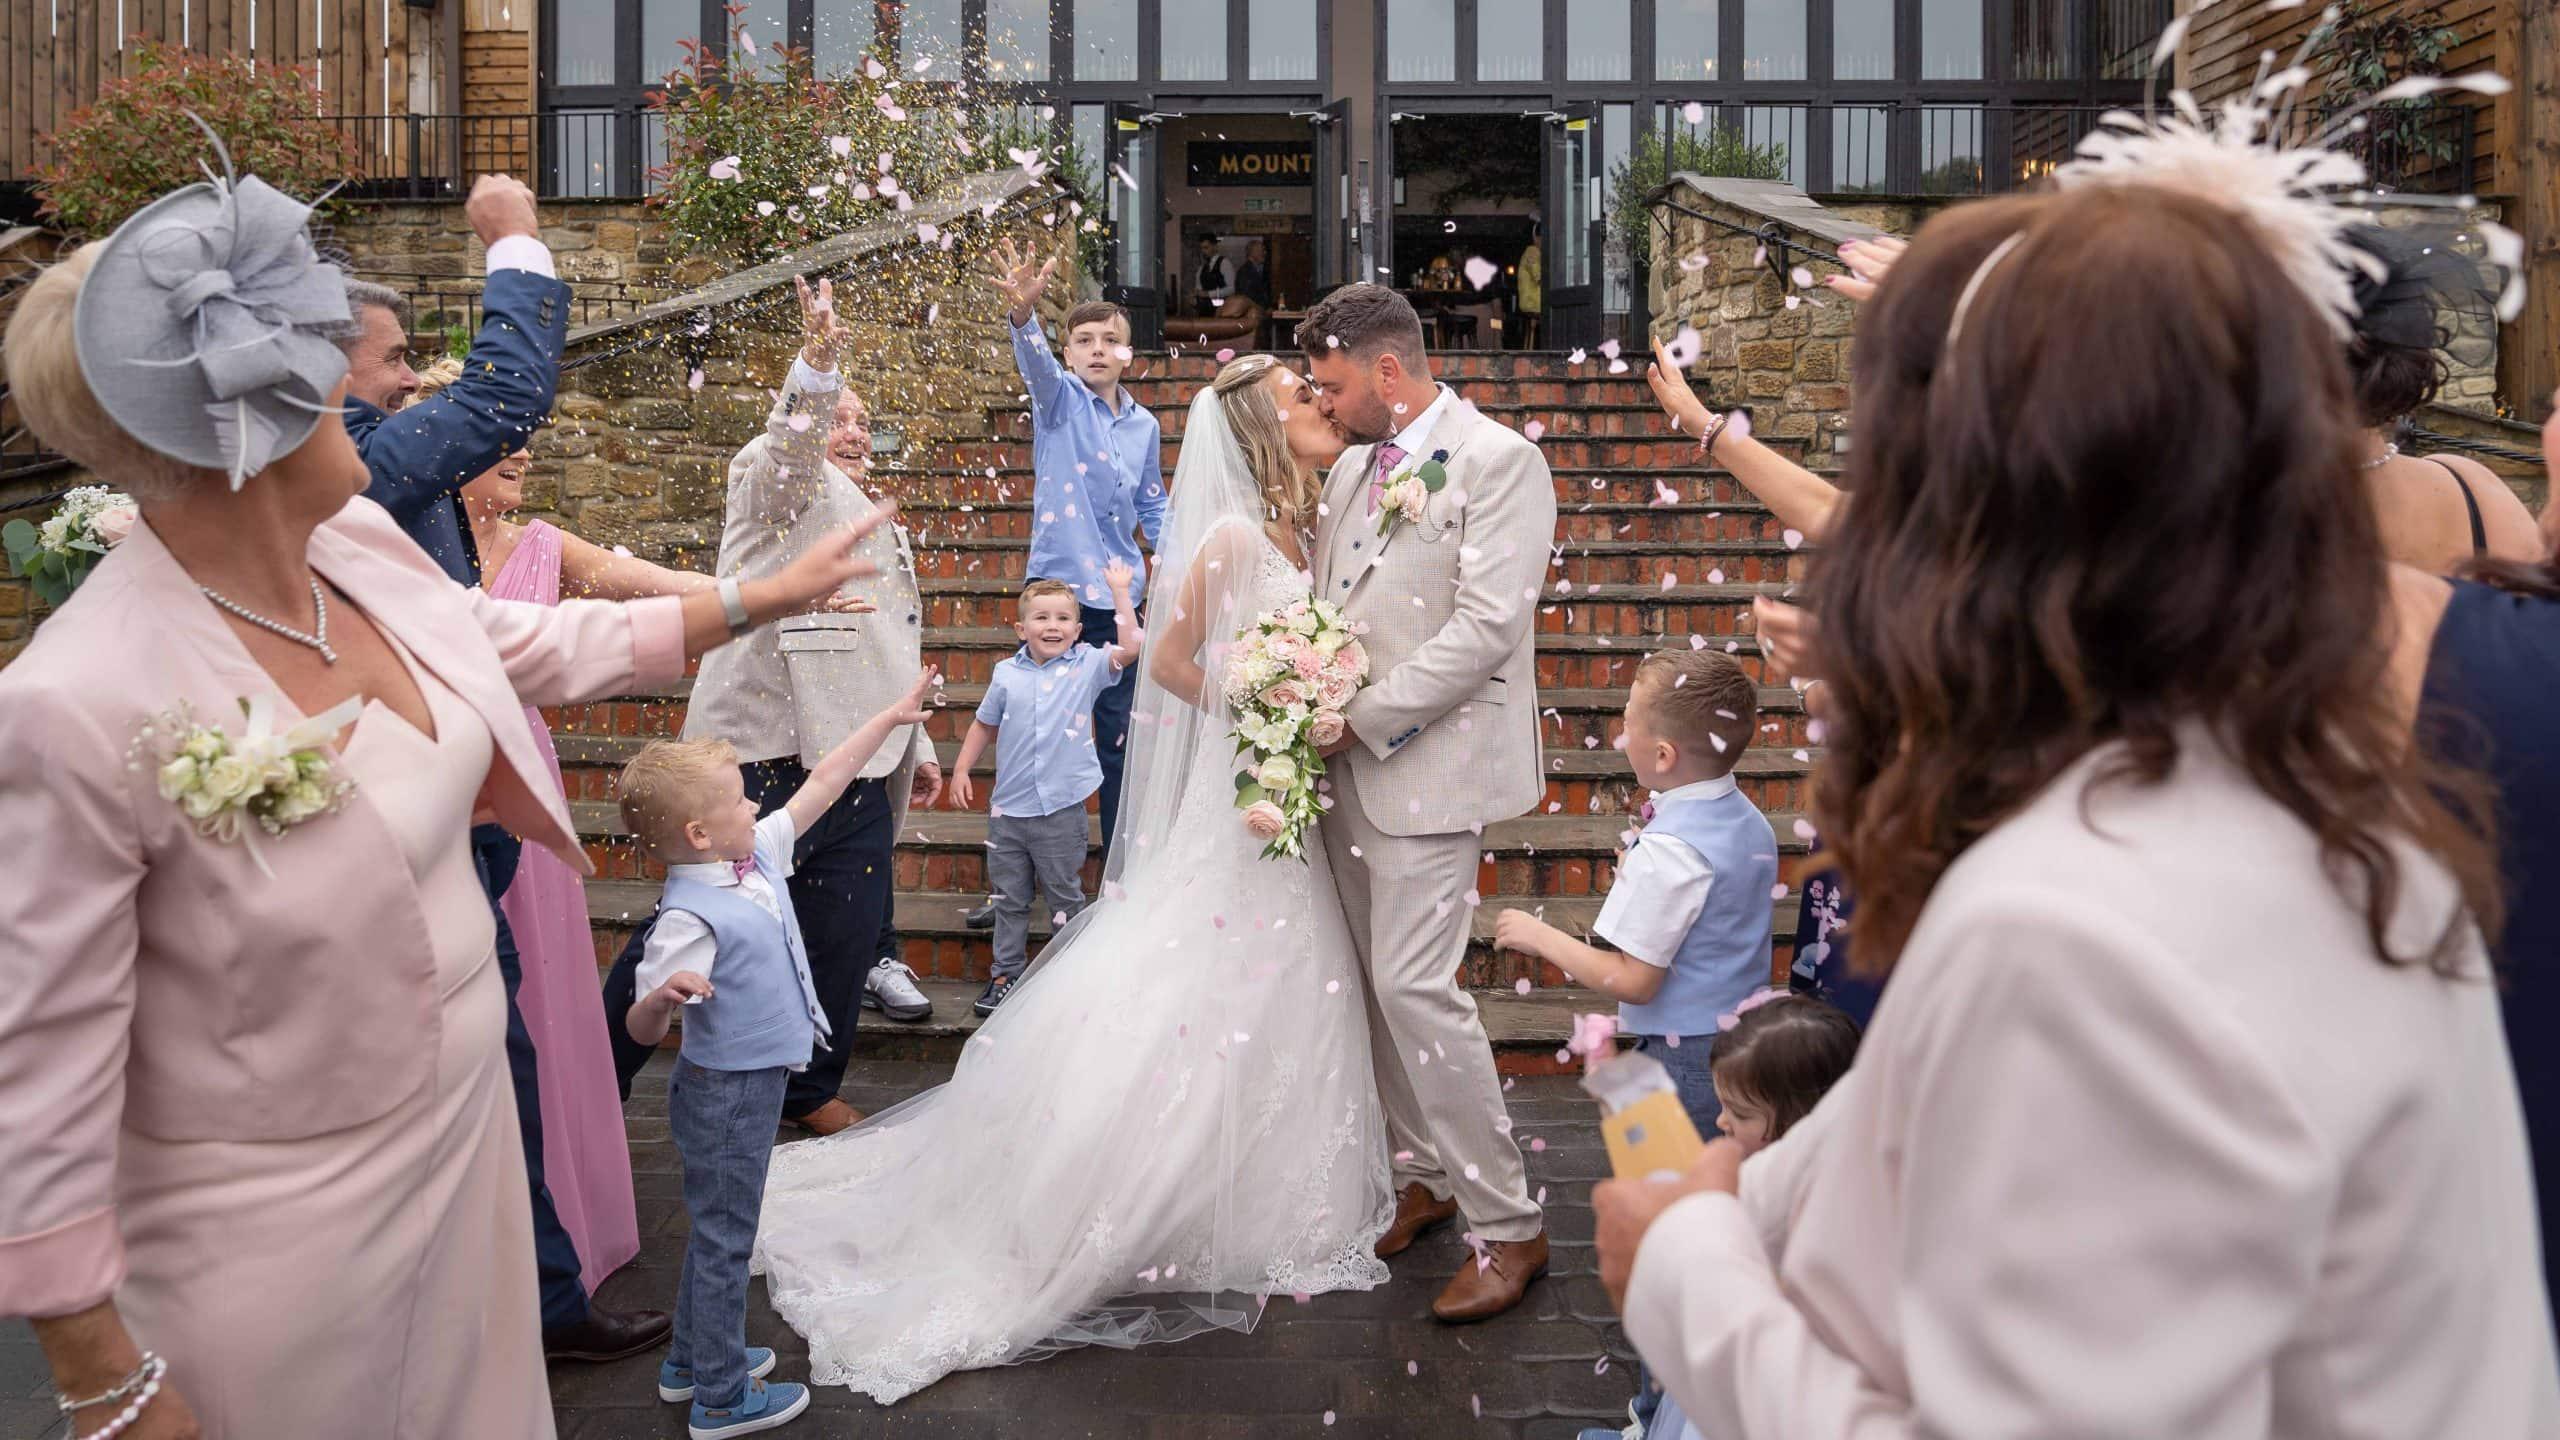 Wedding confetti at South Causey Inn